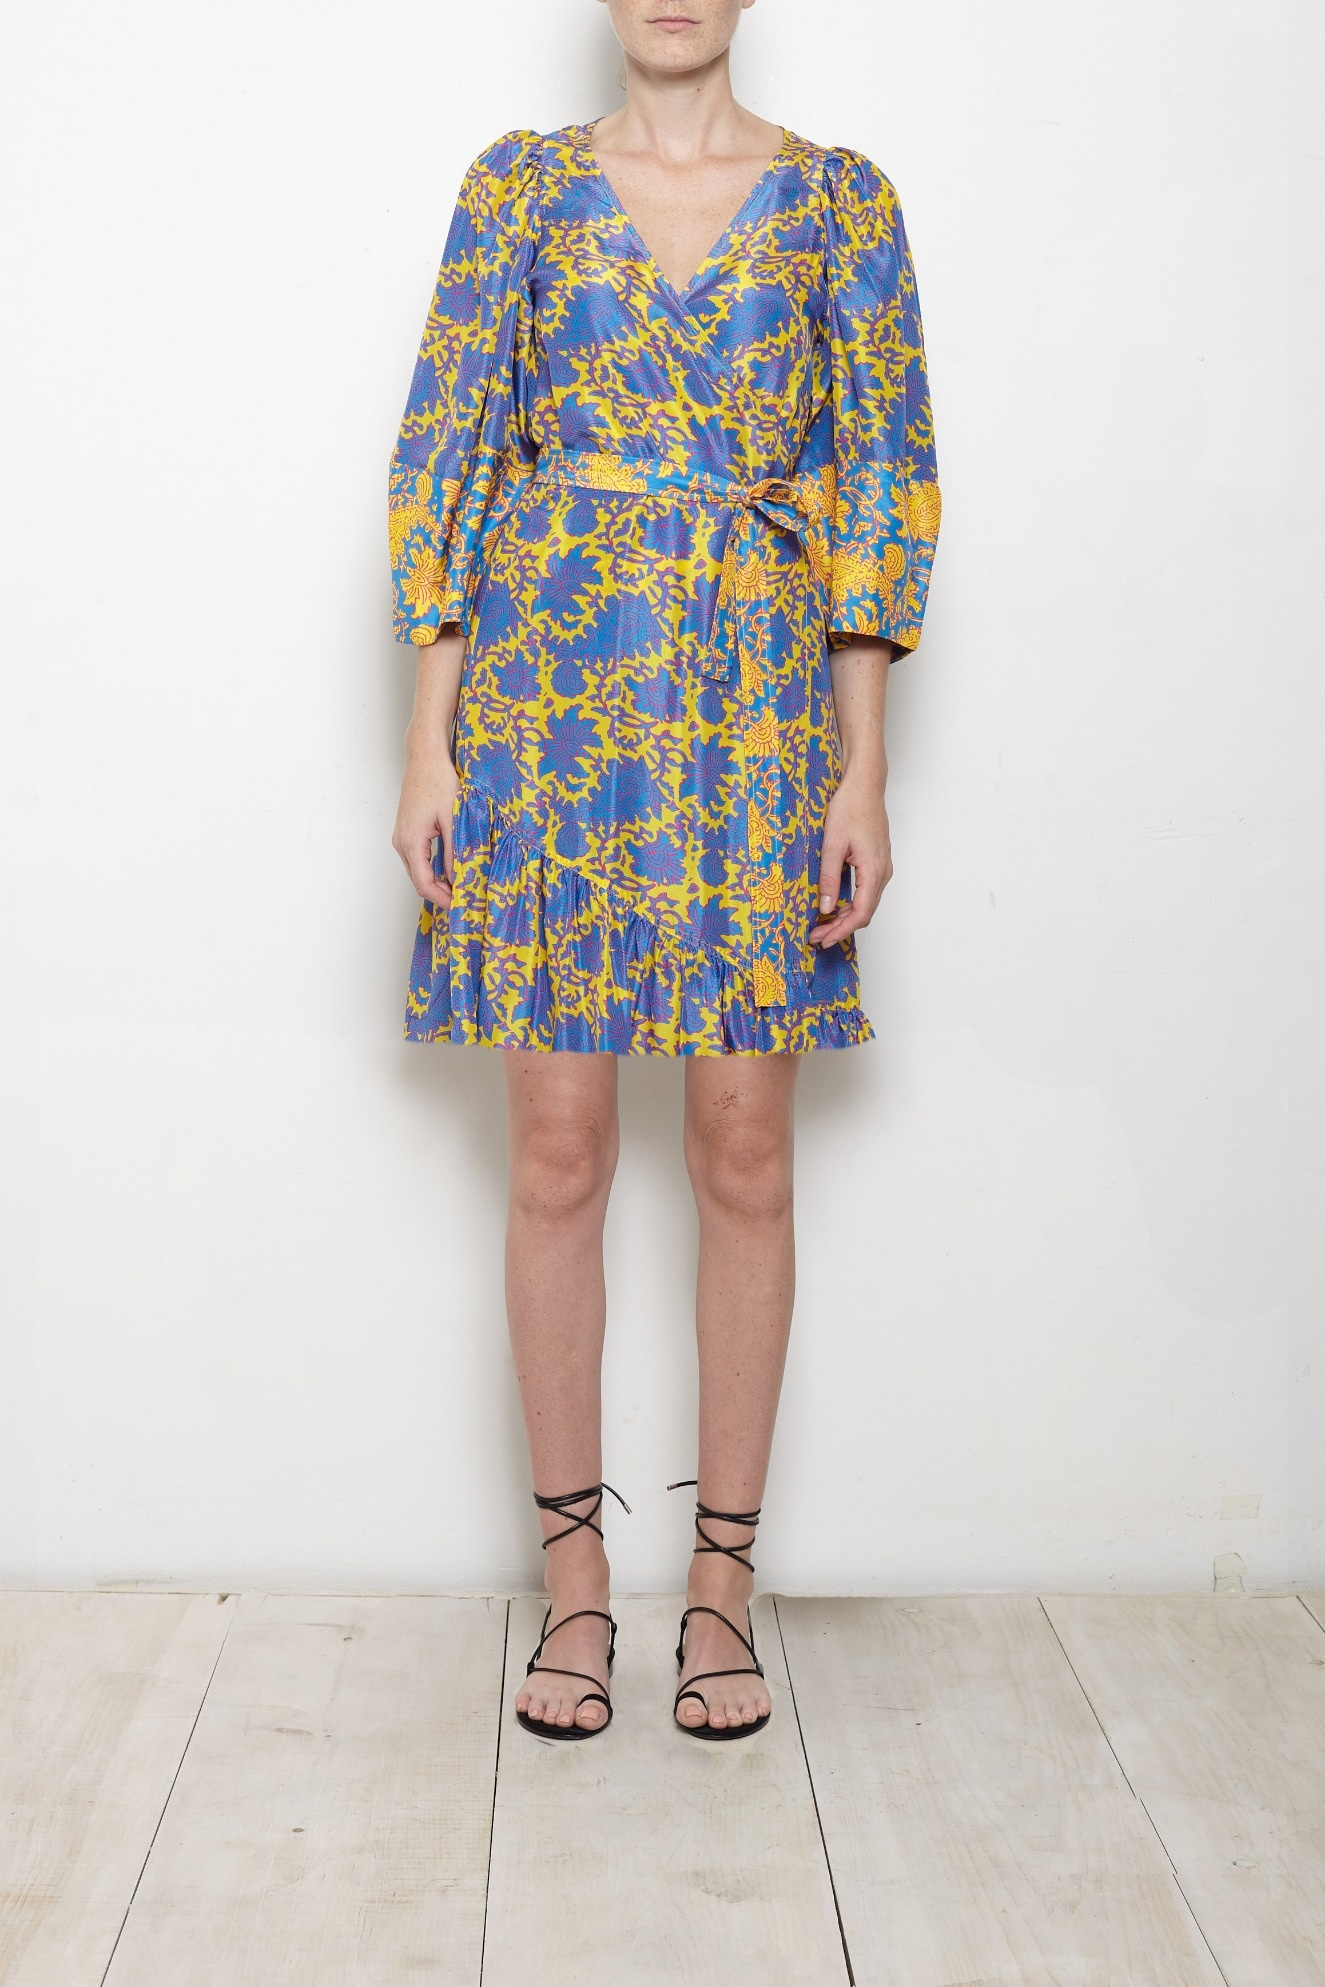 APIECE APART Short Bouganvillea Meru Sleeve Dress